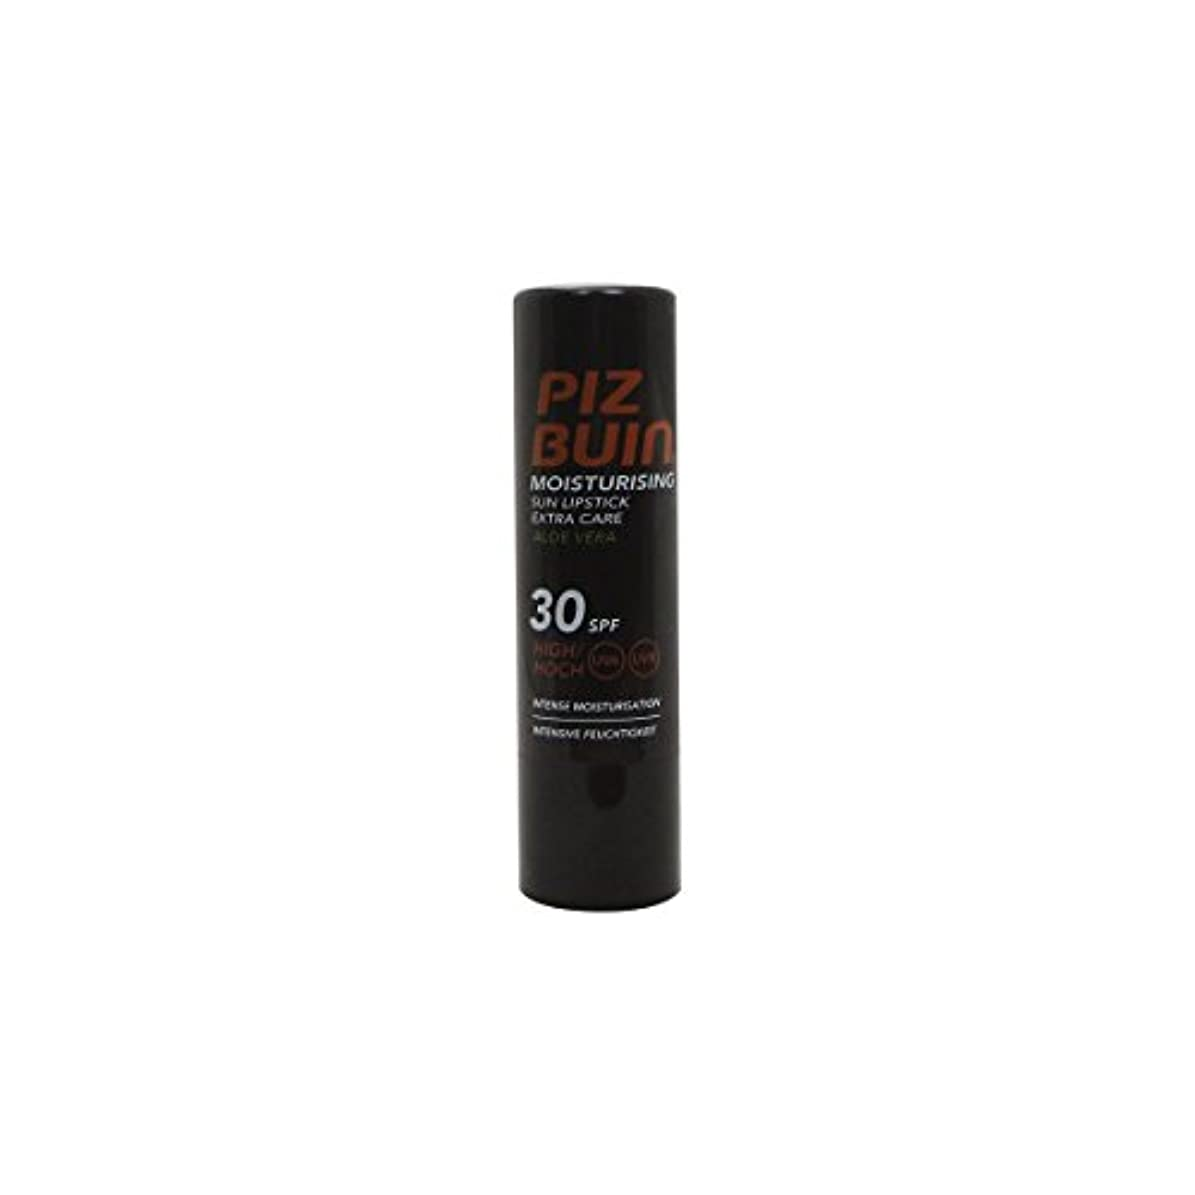 鉱夫展示会気分が悪いPiz Buin Lipstick Spf 30 Moisturising With Aloe Vera5g [並行輸入品]